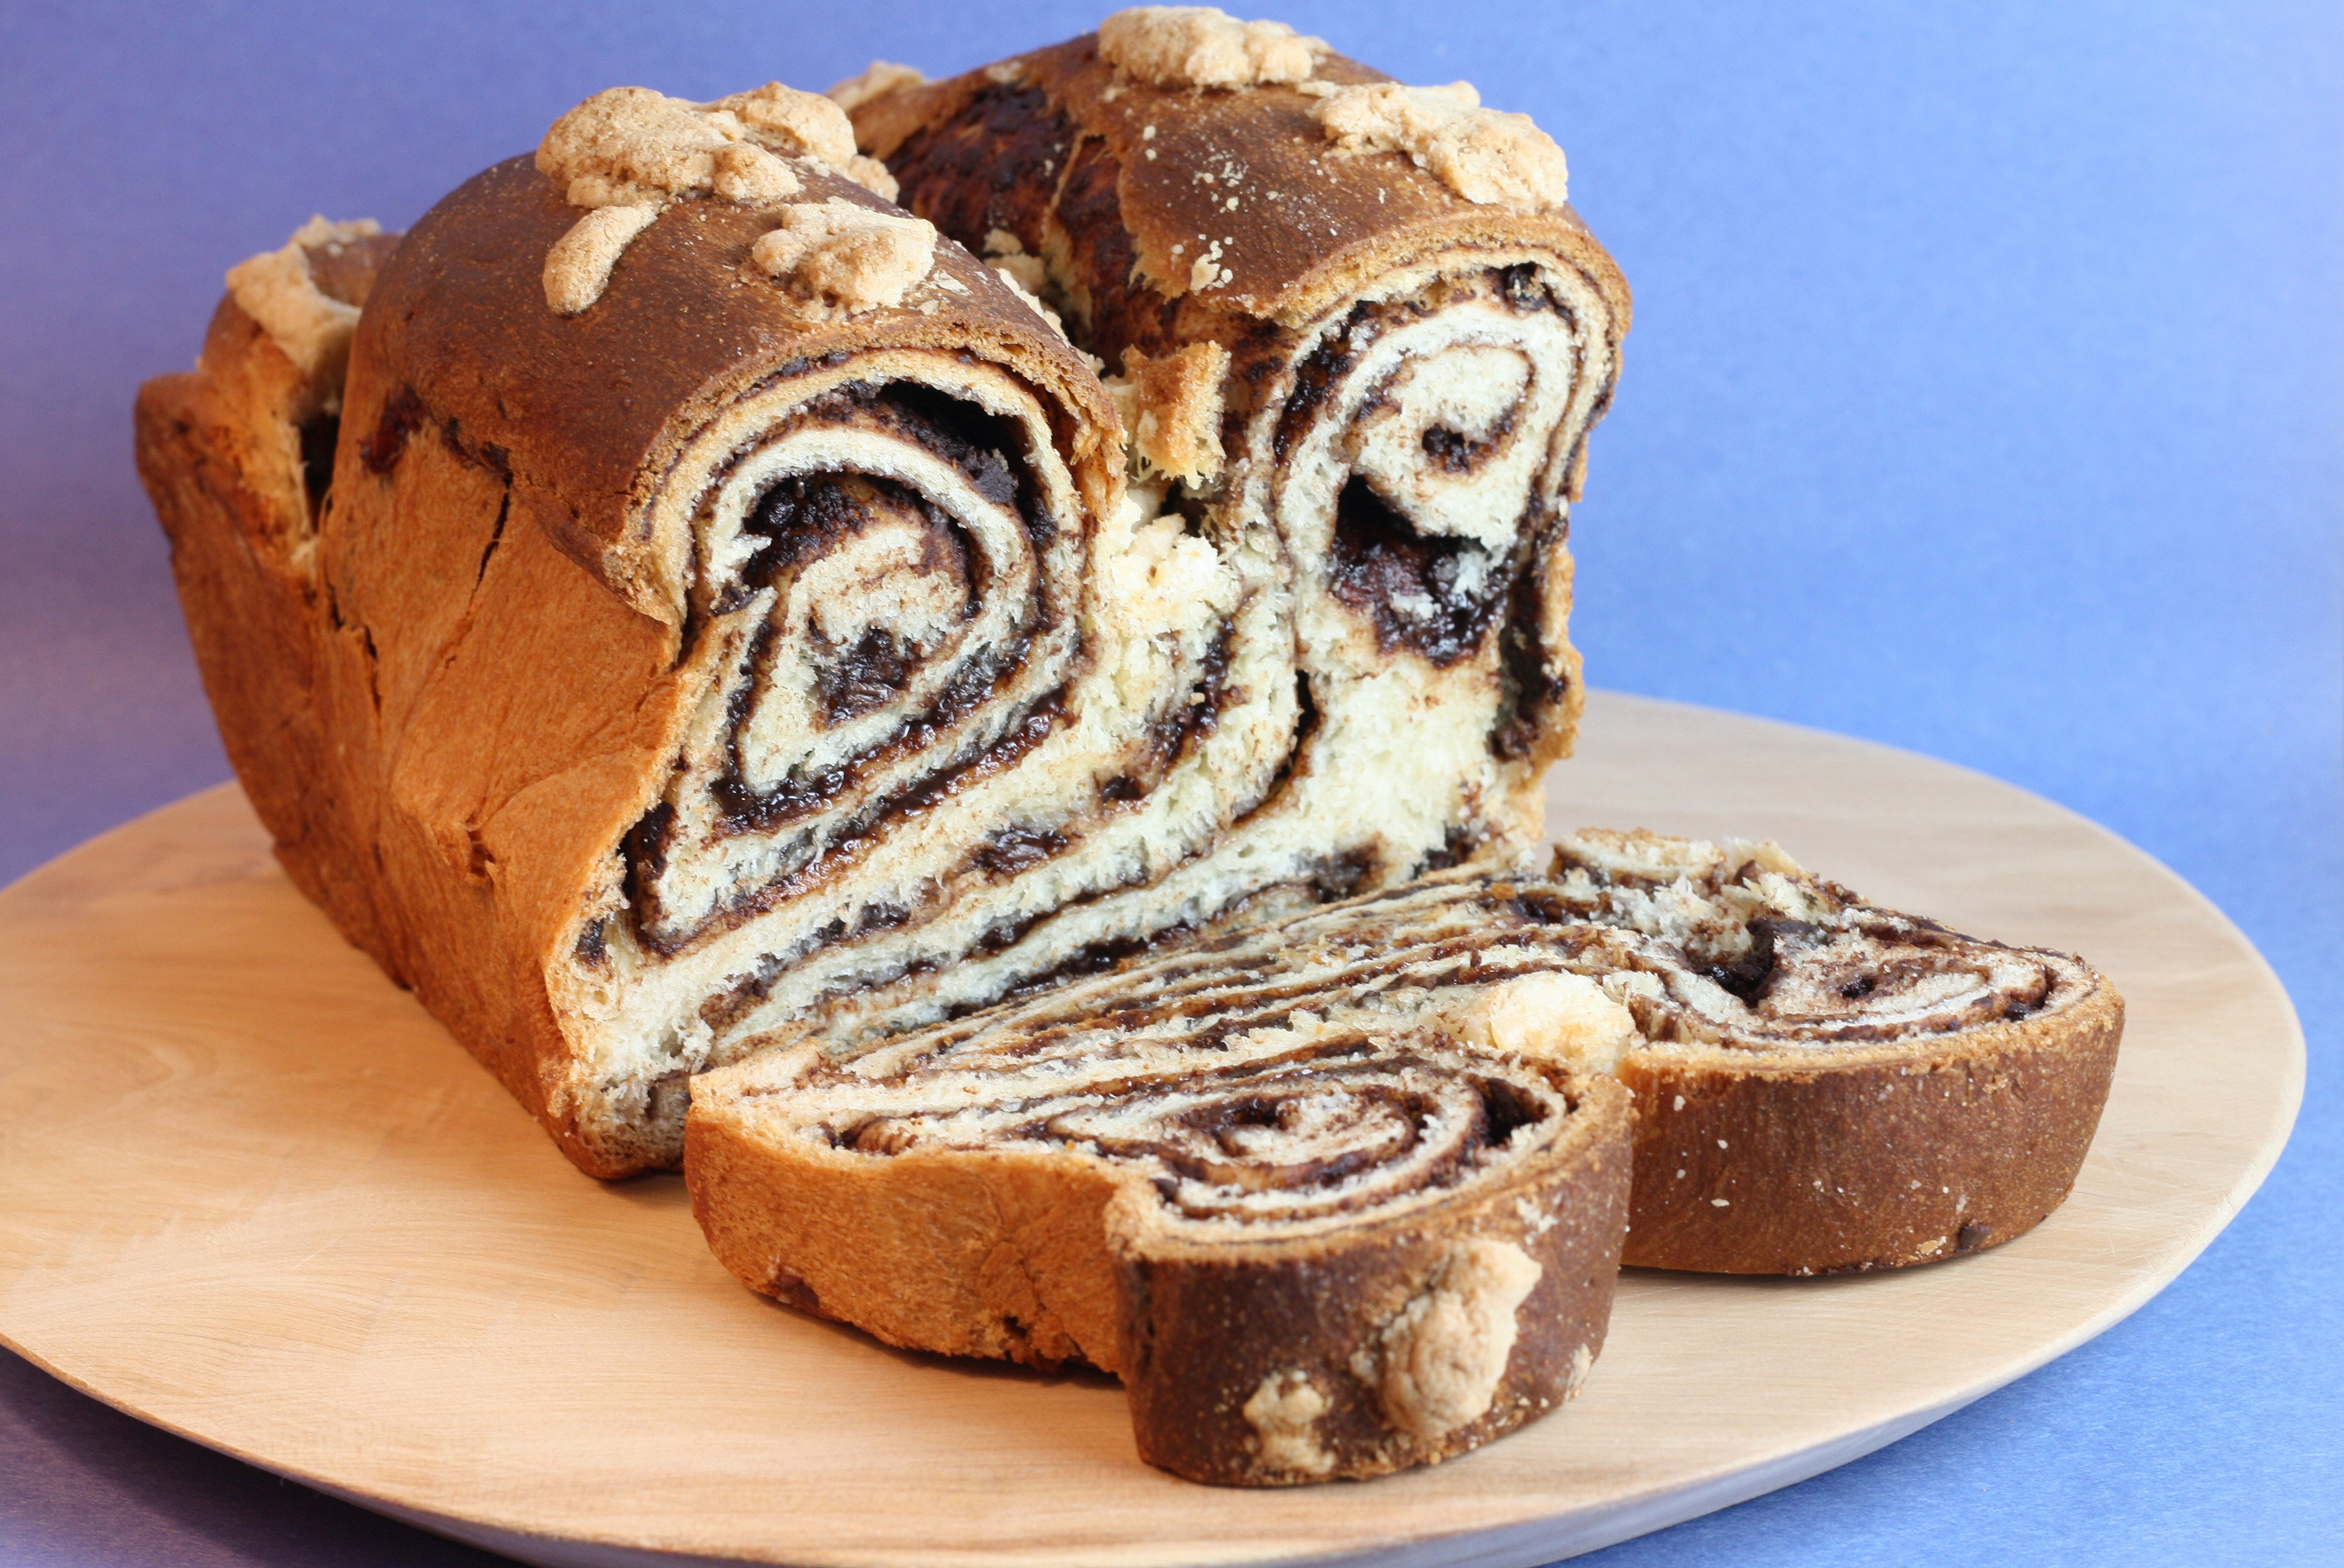 Chocolate Babka – First Look, Then Cook